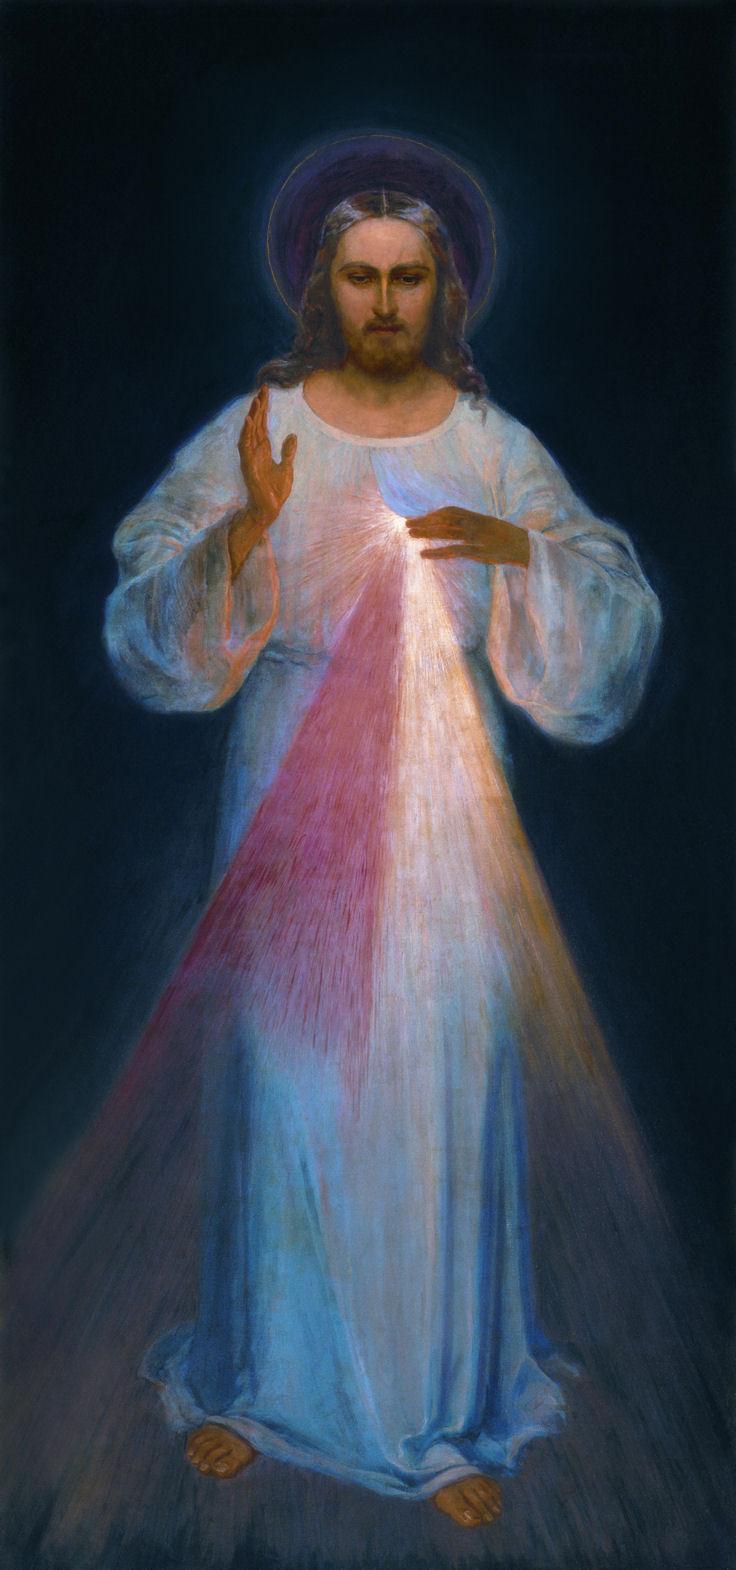 Kazimirowski_Eugeniusz,_Divine_Mercy,_1934.jpg